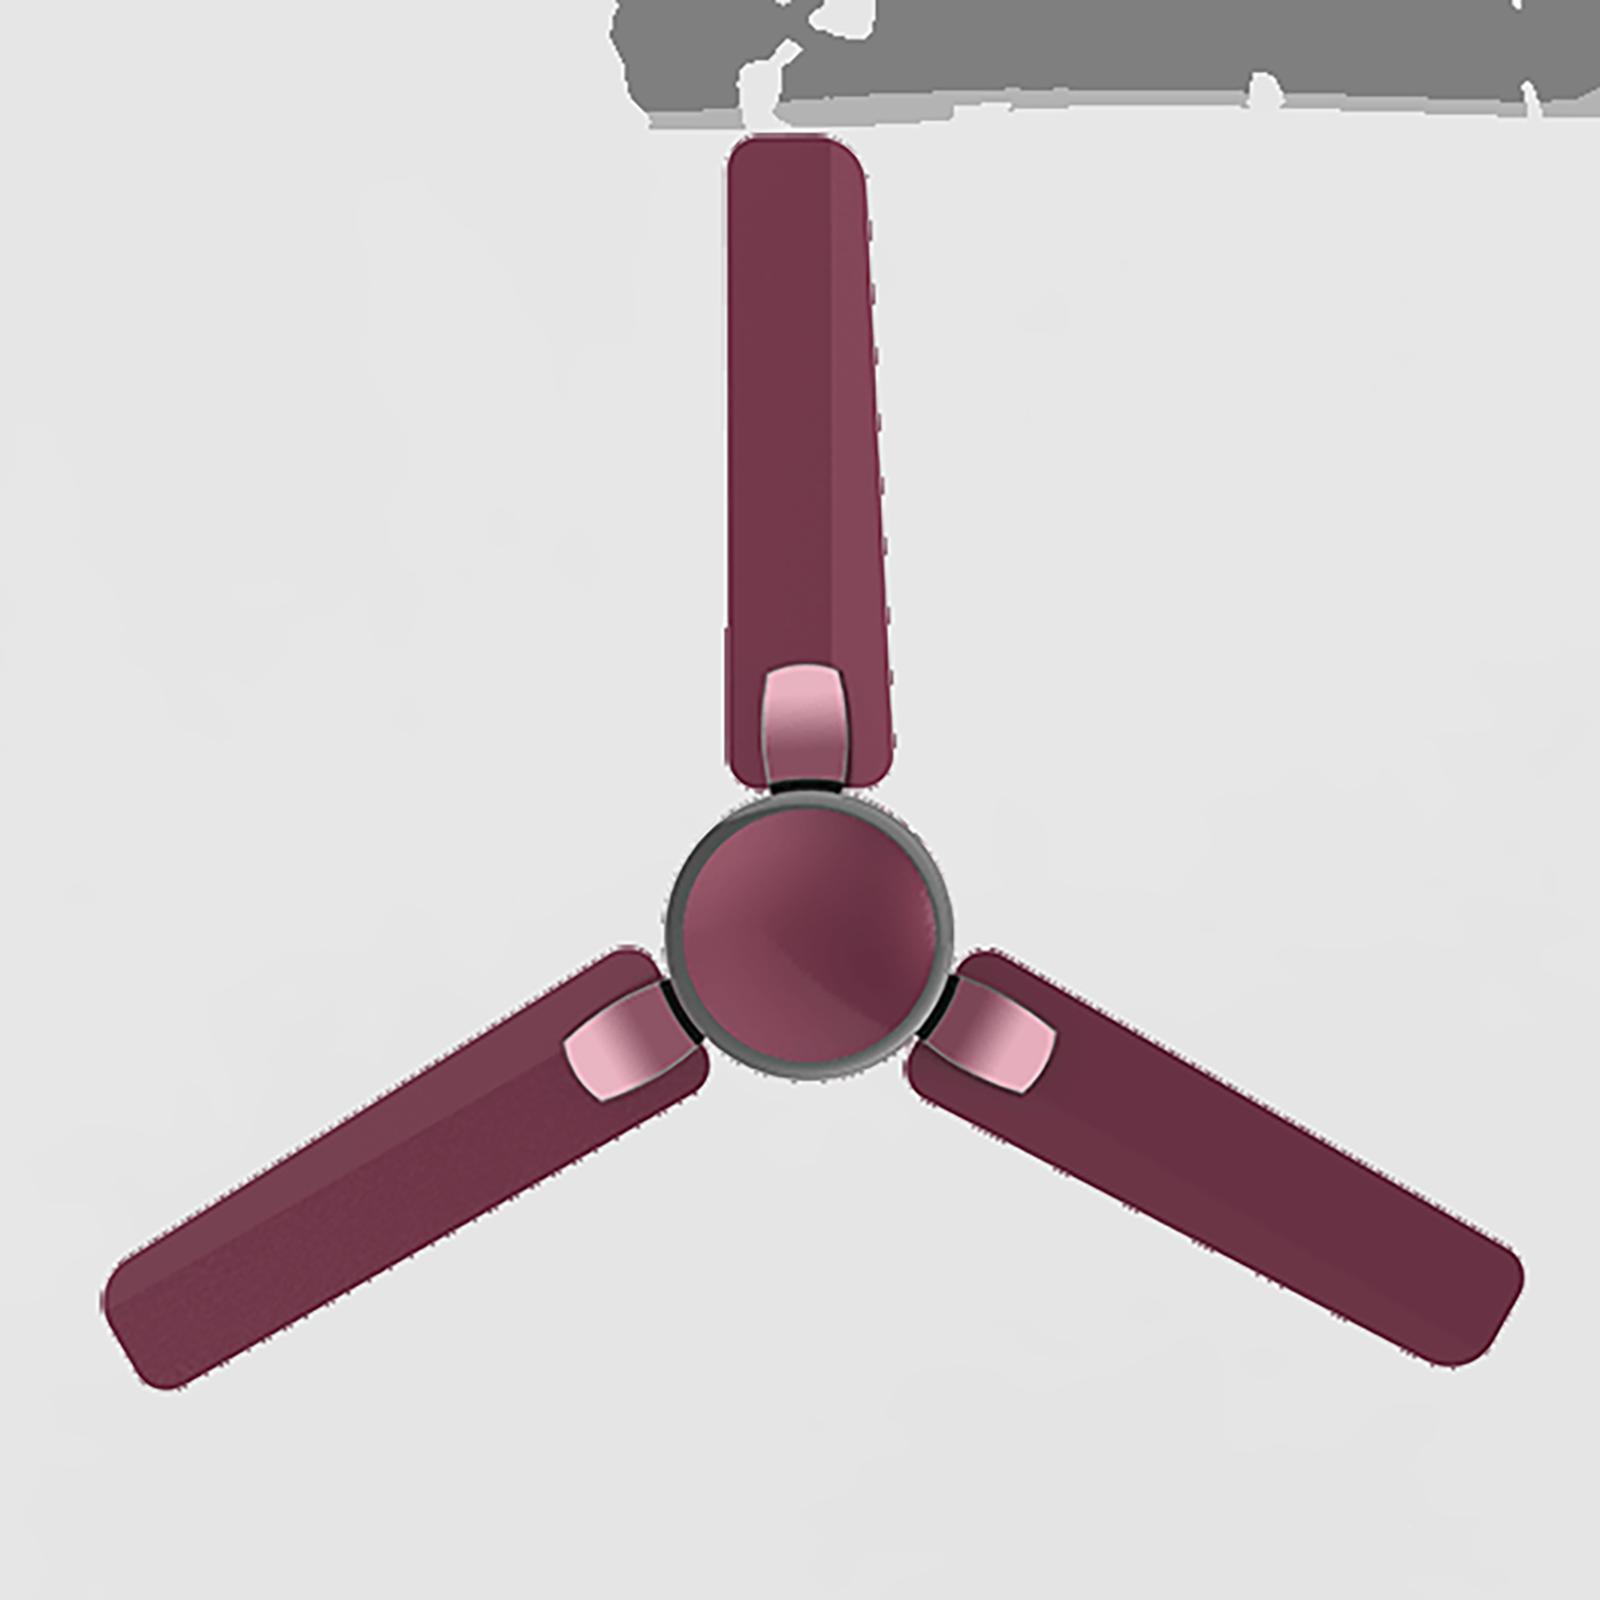 Crompton Markle Prime 120cm 3 Blade Ceiling Fan (Anti-Dust Technology, CFHSMKPM48BGDAD1S, Burgundy)_1